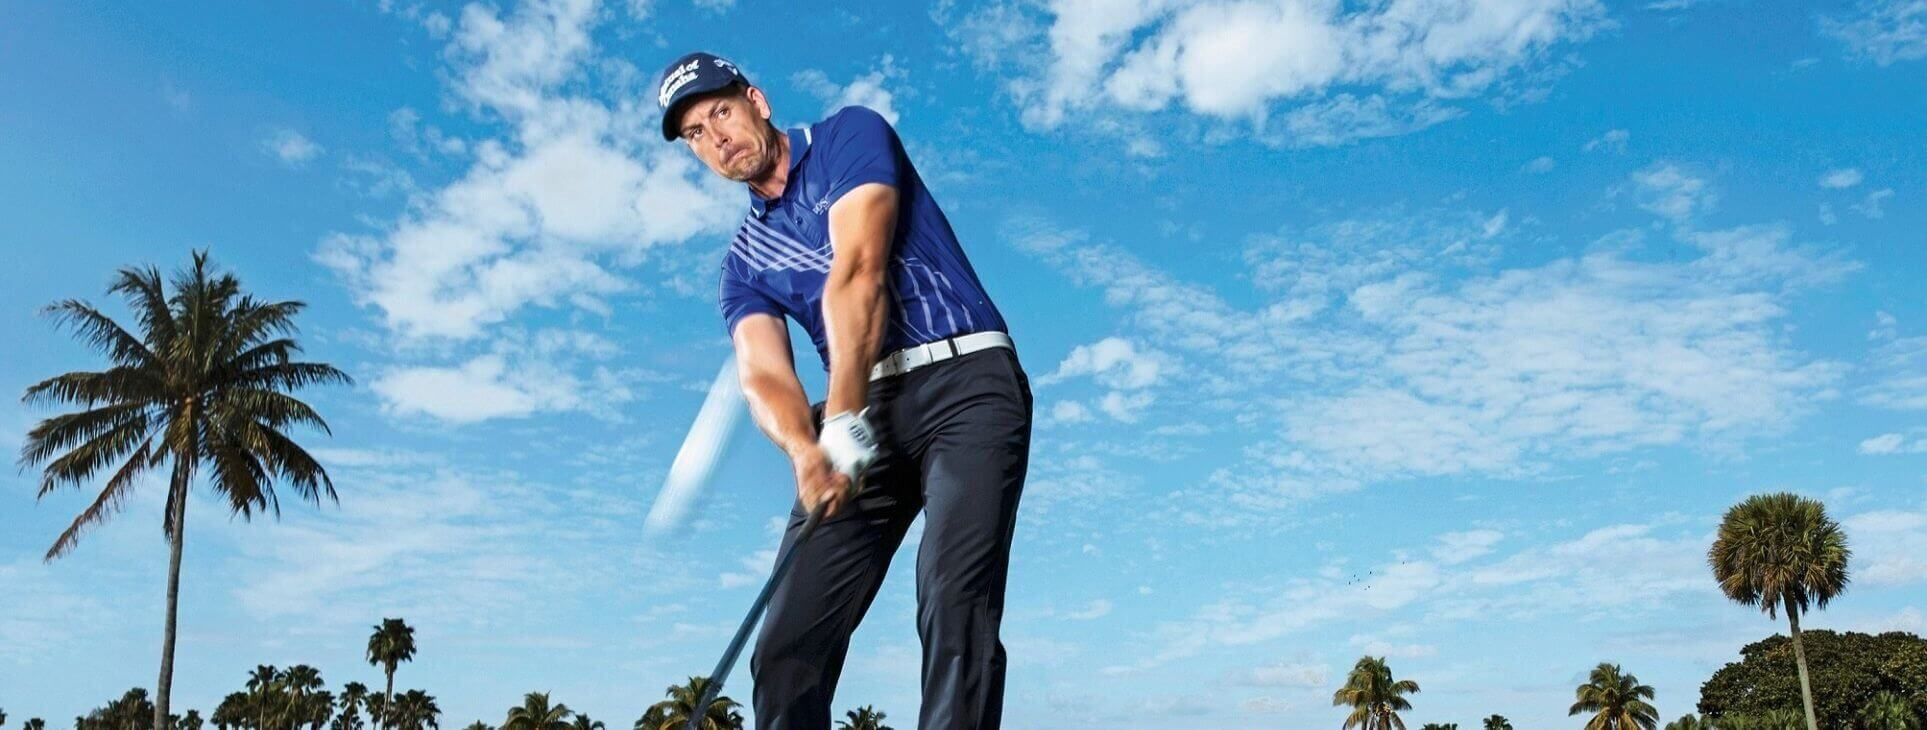 Golfnyheter-Golfdigest